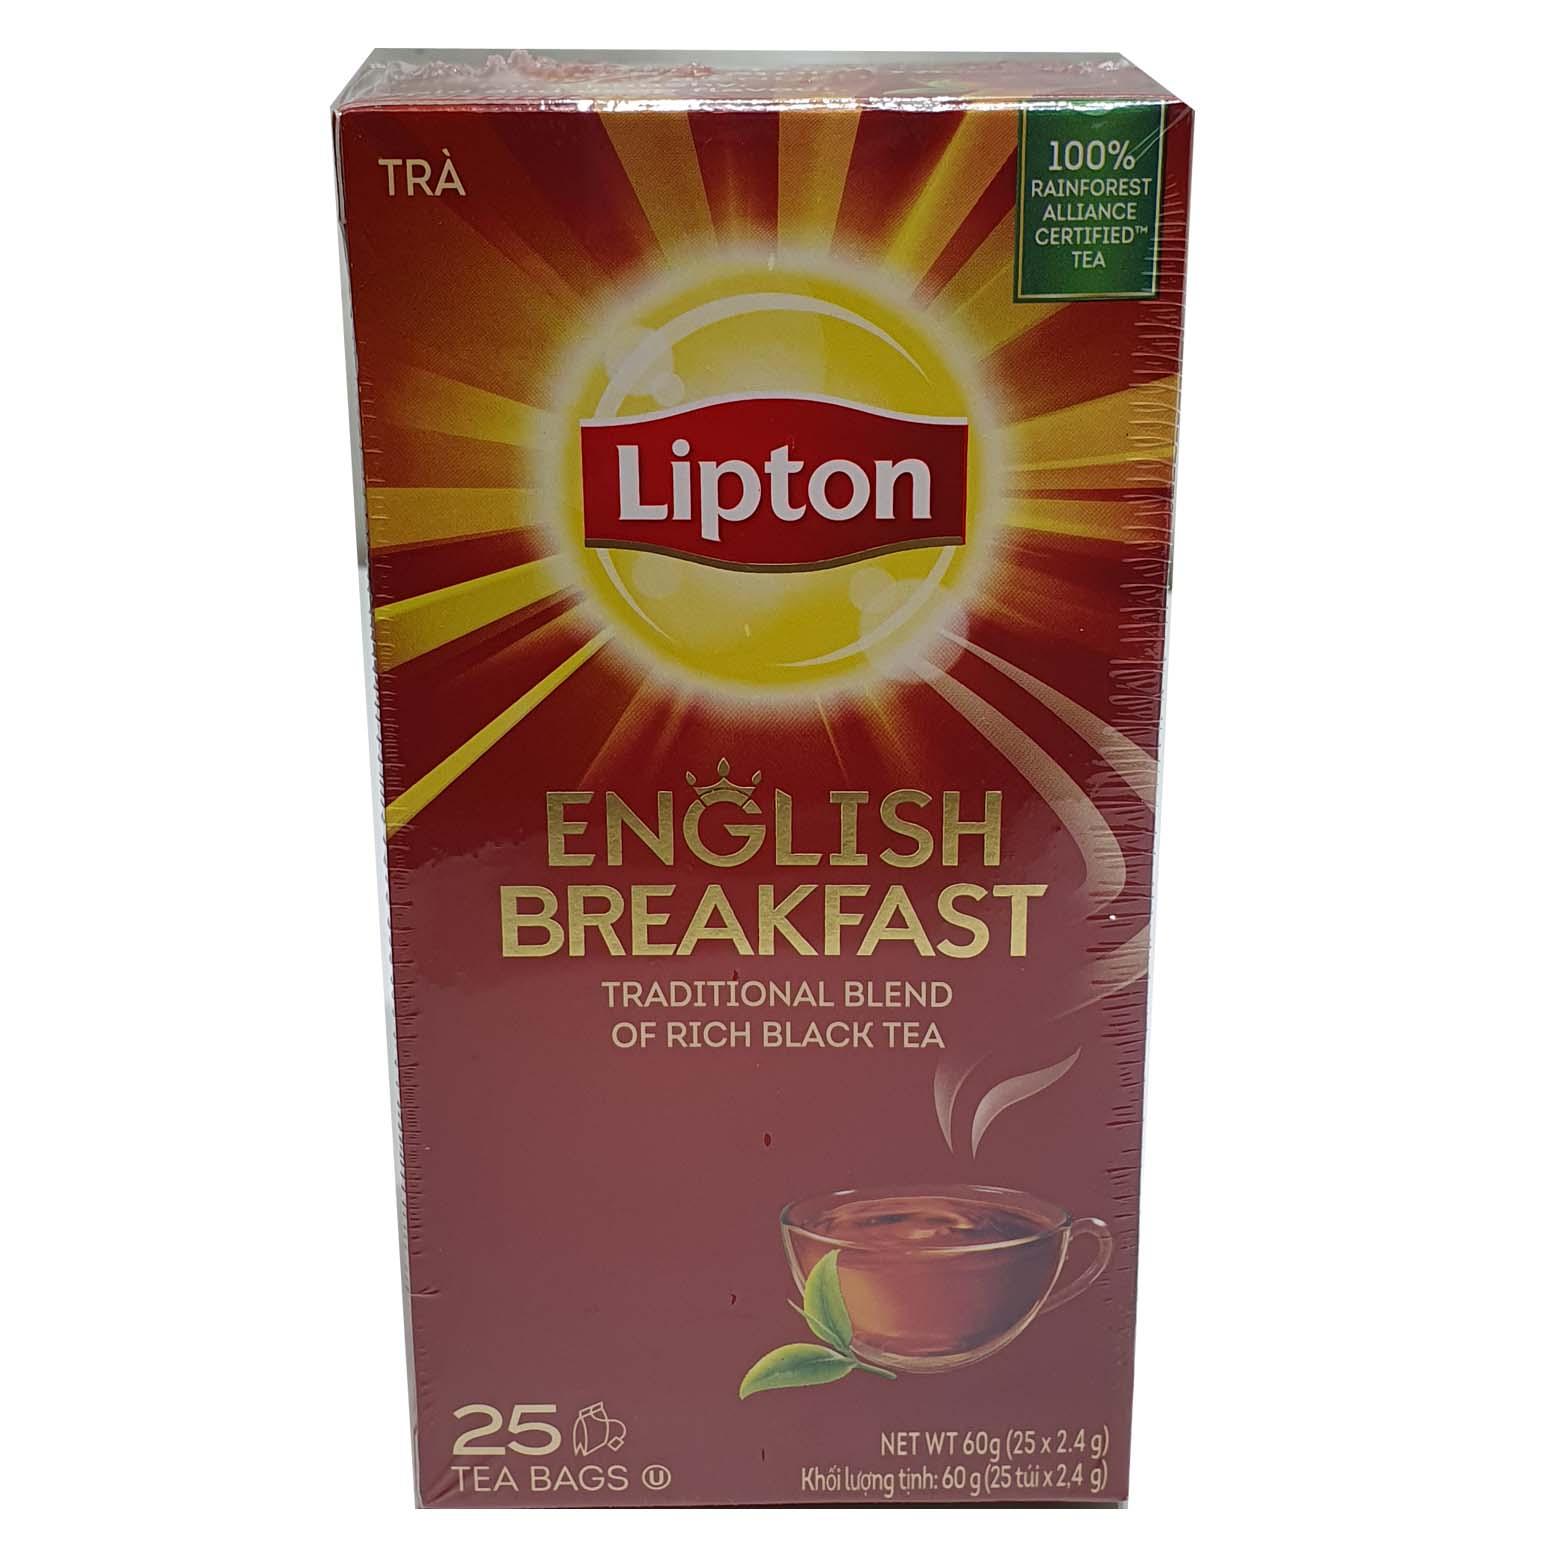 Lipton English Breakfast25s Tea Bags